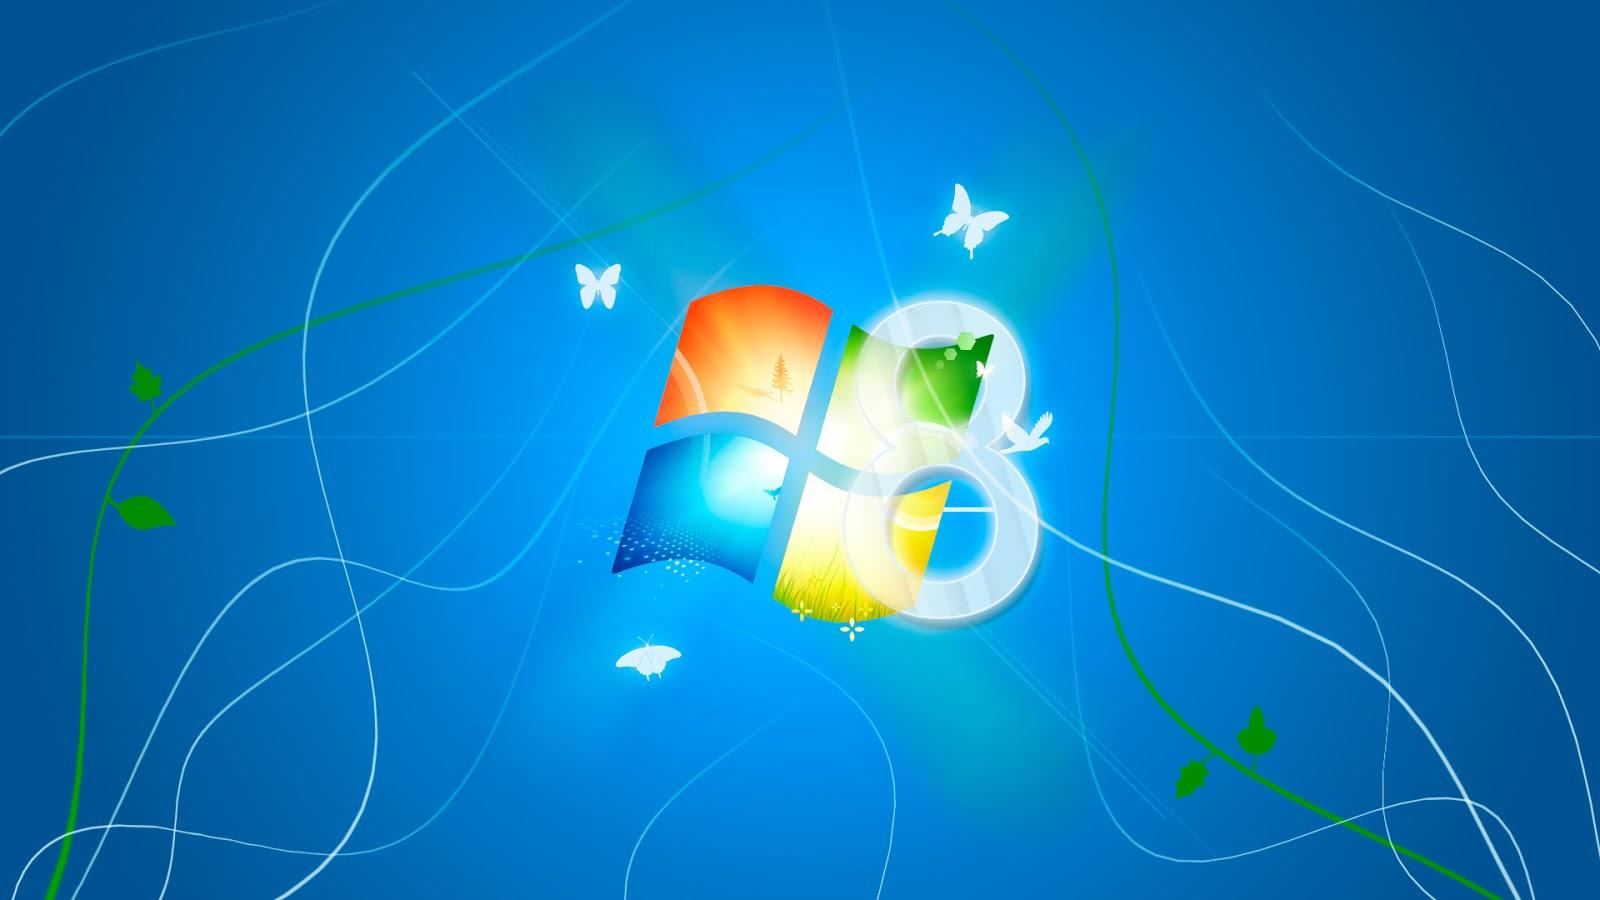 http://4.bp.blogspot.com/-VIAJklhmjdA/UPRKTfTUFbI/AAAAAAAAB8o/WIAnRa0Tyf8/s1600/Window+8+HD+Wallpaper.jpg